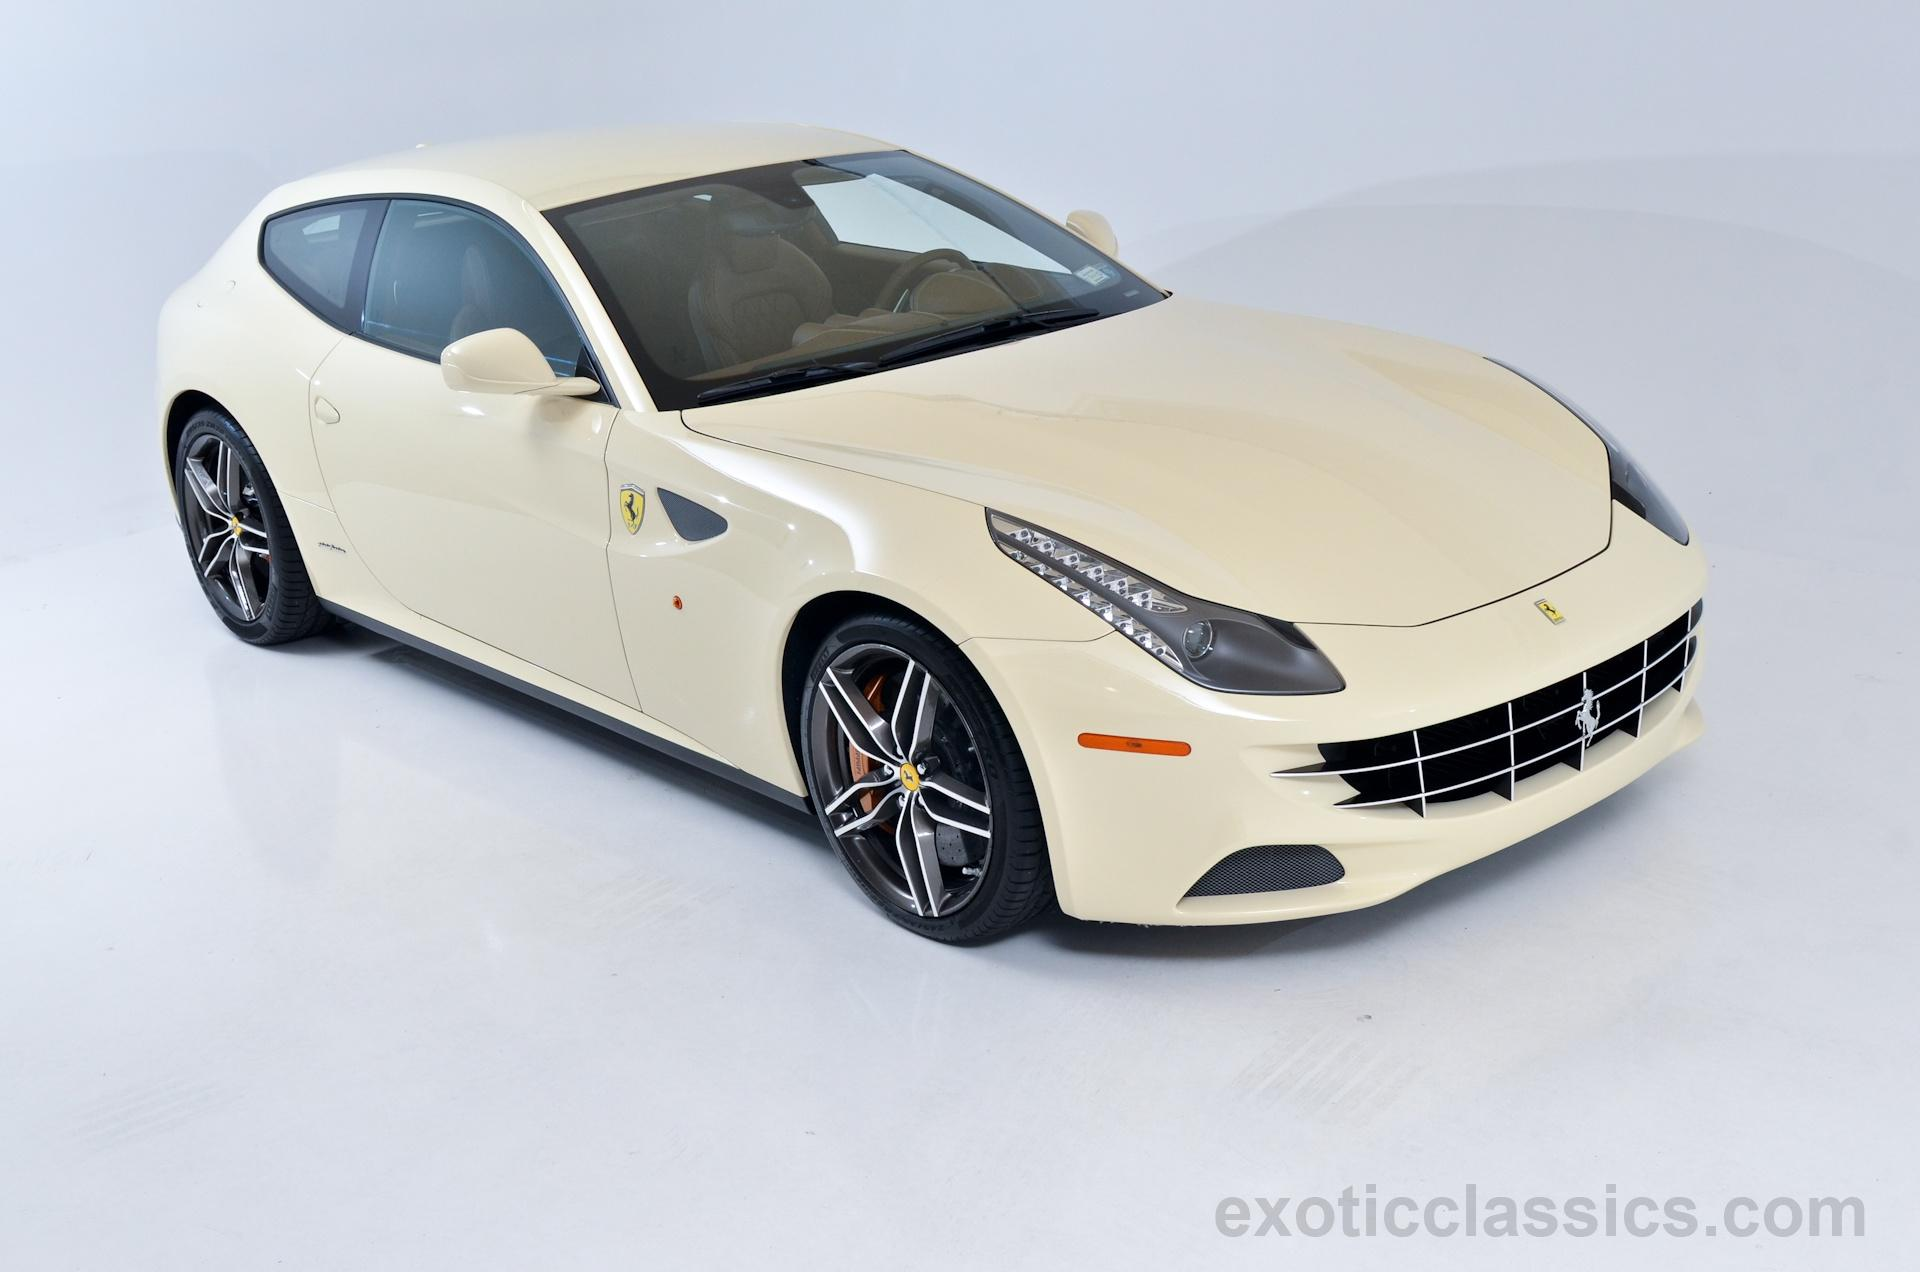 2012 ferrari ff exotic and classic car dealership specializing 2012 ferrari ff vanachro Image collections